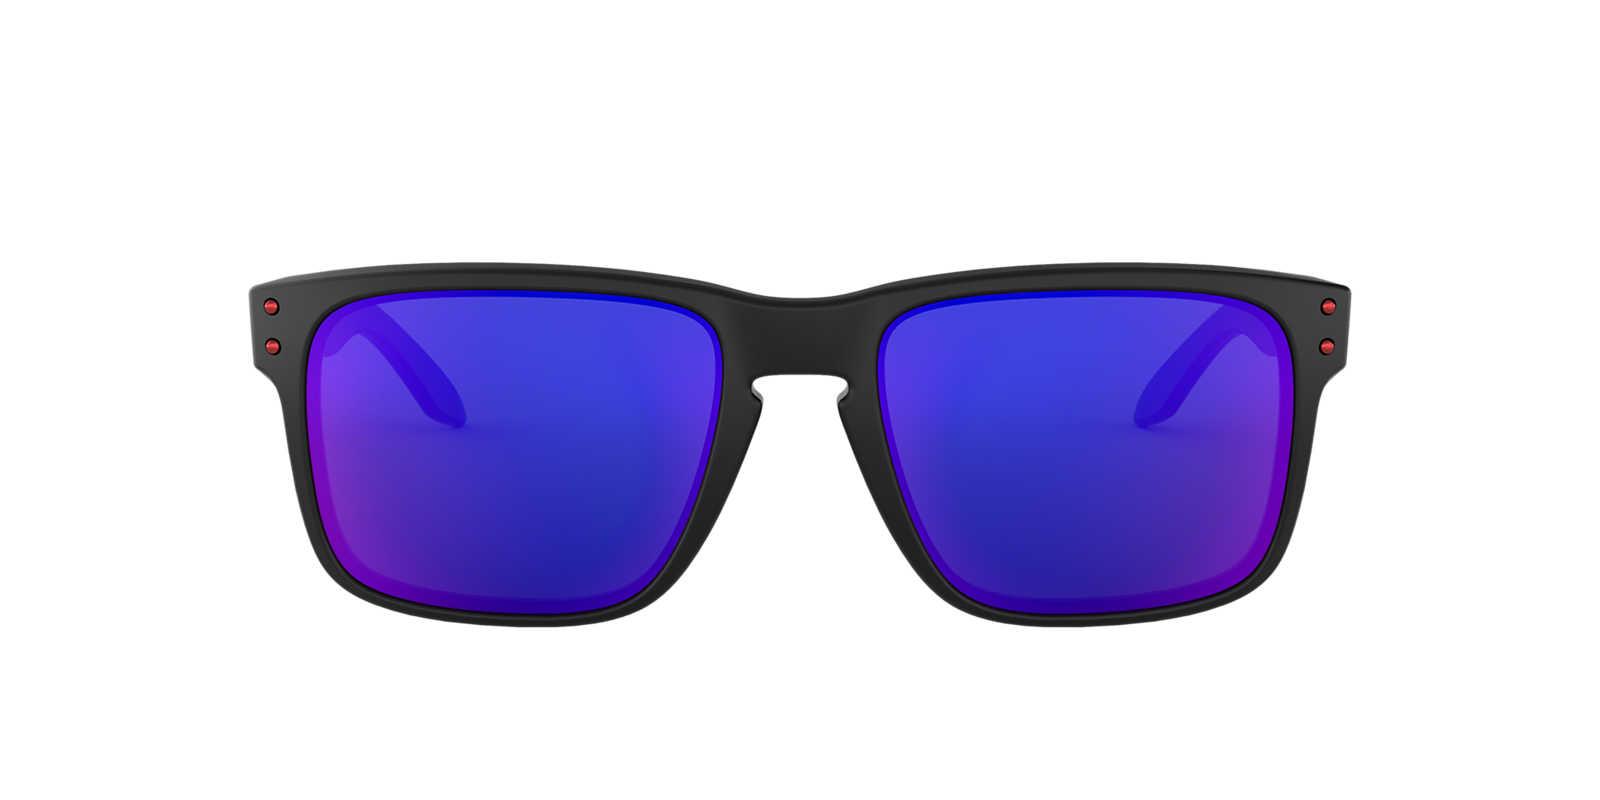 93c0701c2d9 Oakley Tennis Sunglasses Uk « Heritage Malta